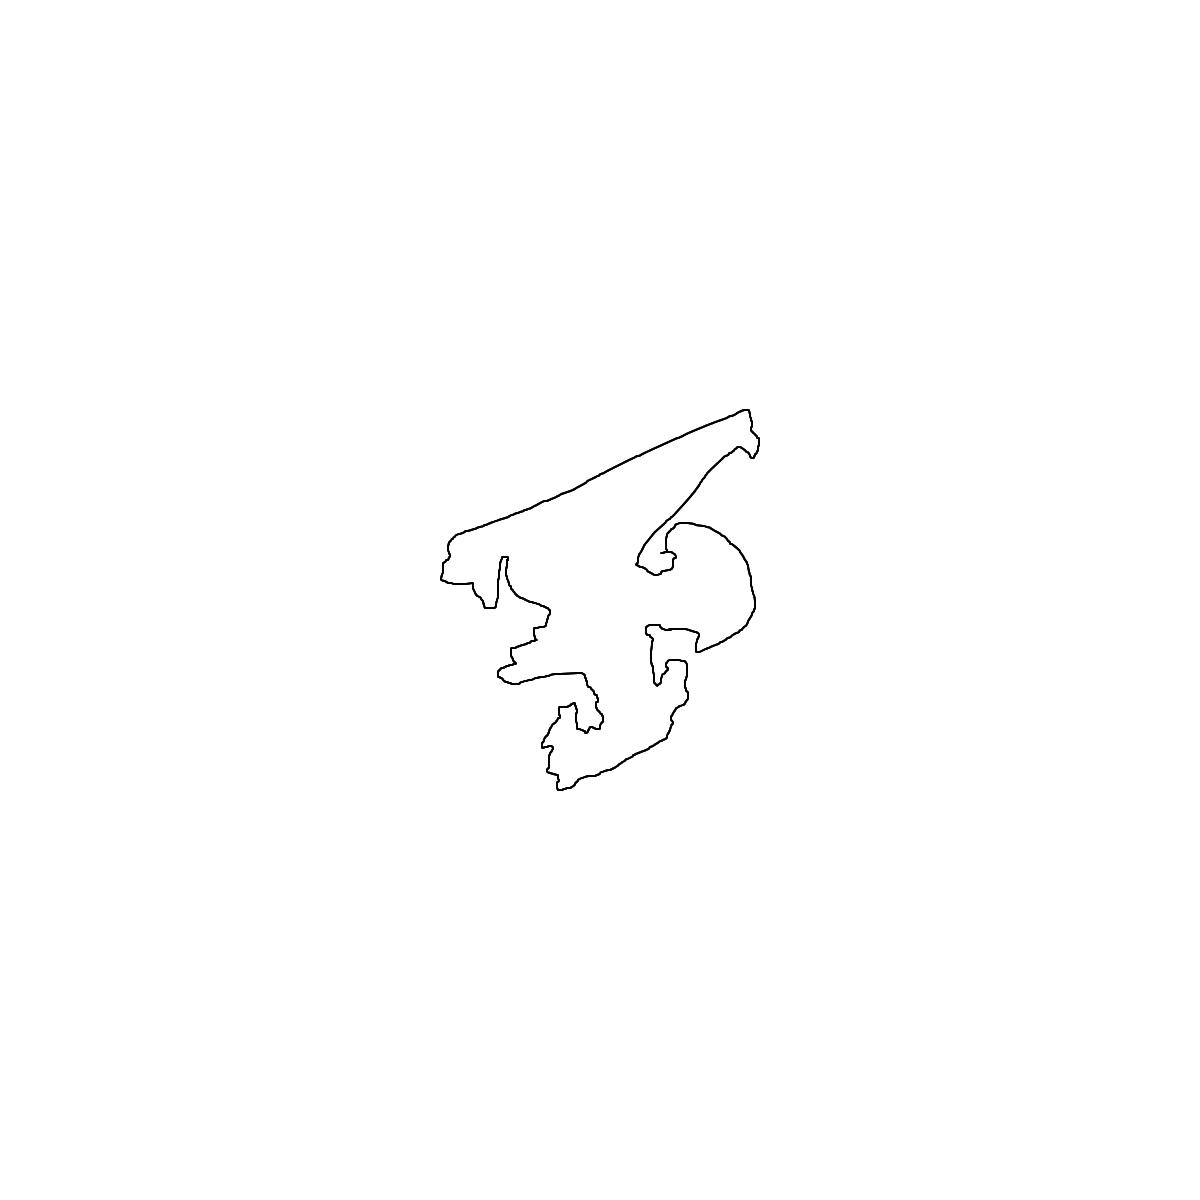 BAAAM drawing#18218 lat:49.4823989868164060lng: 16.9354267120361330